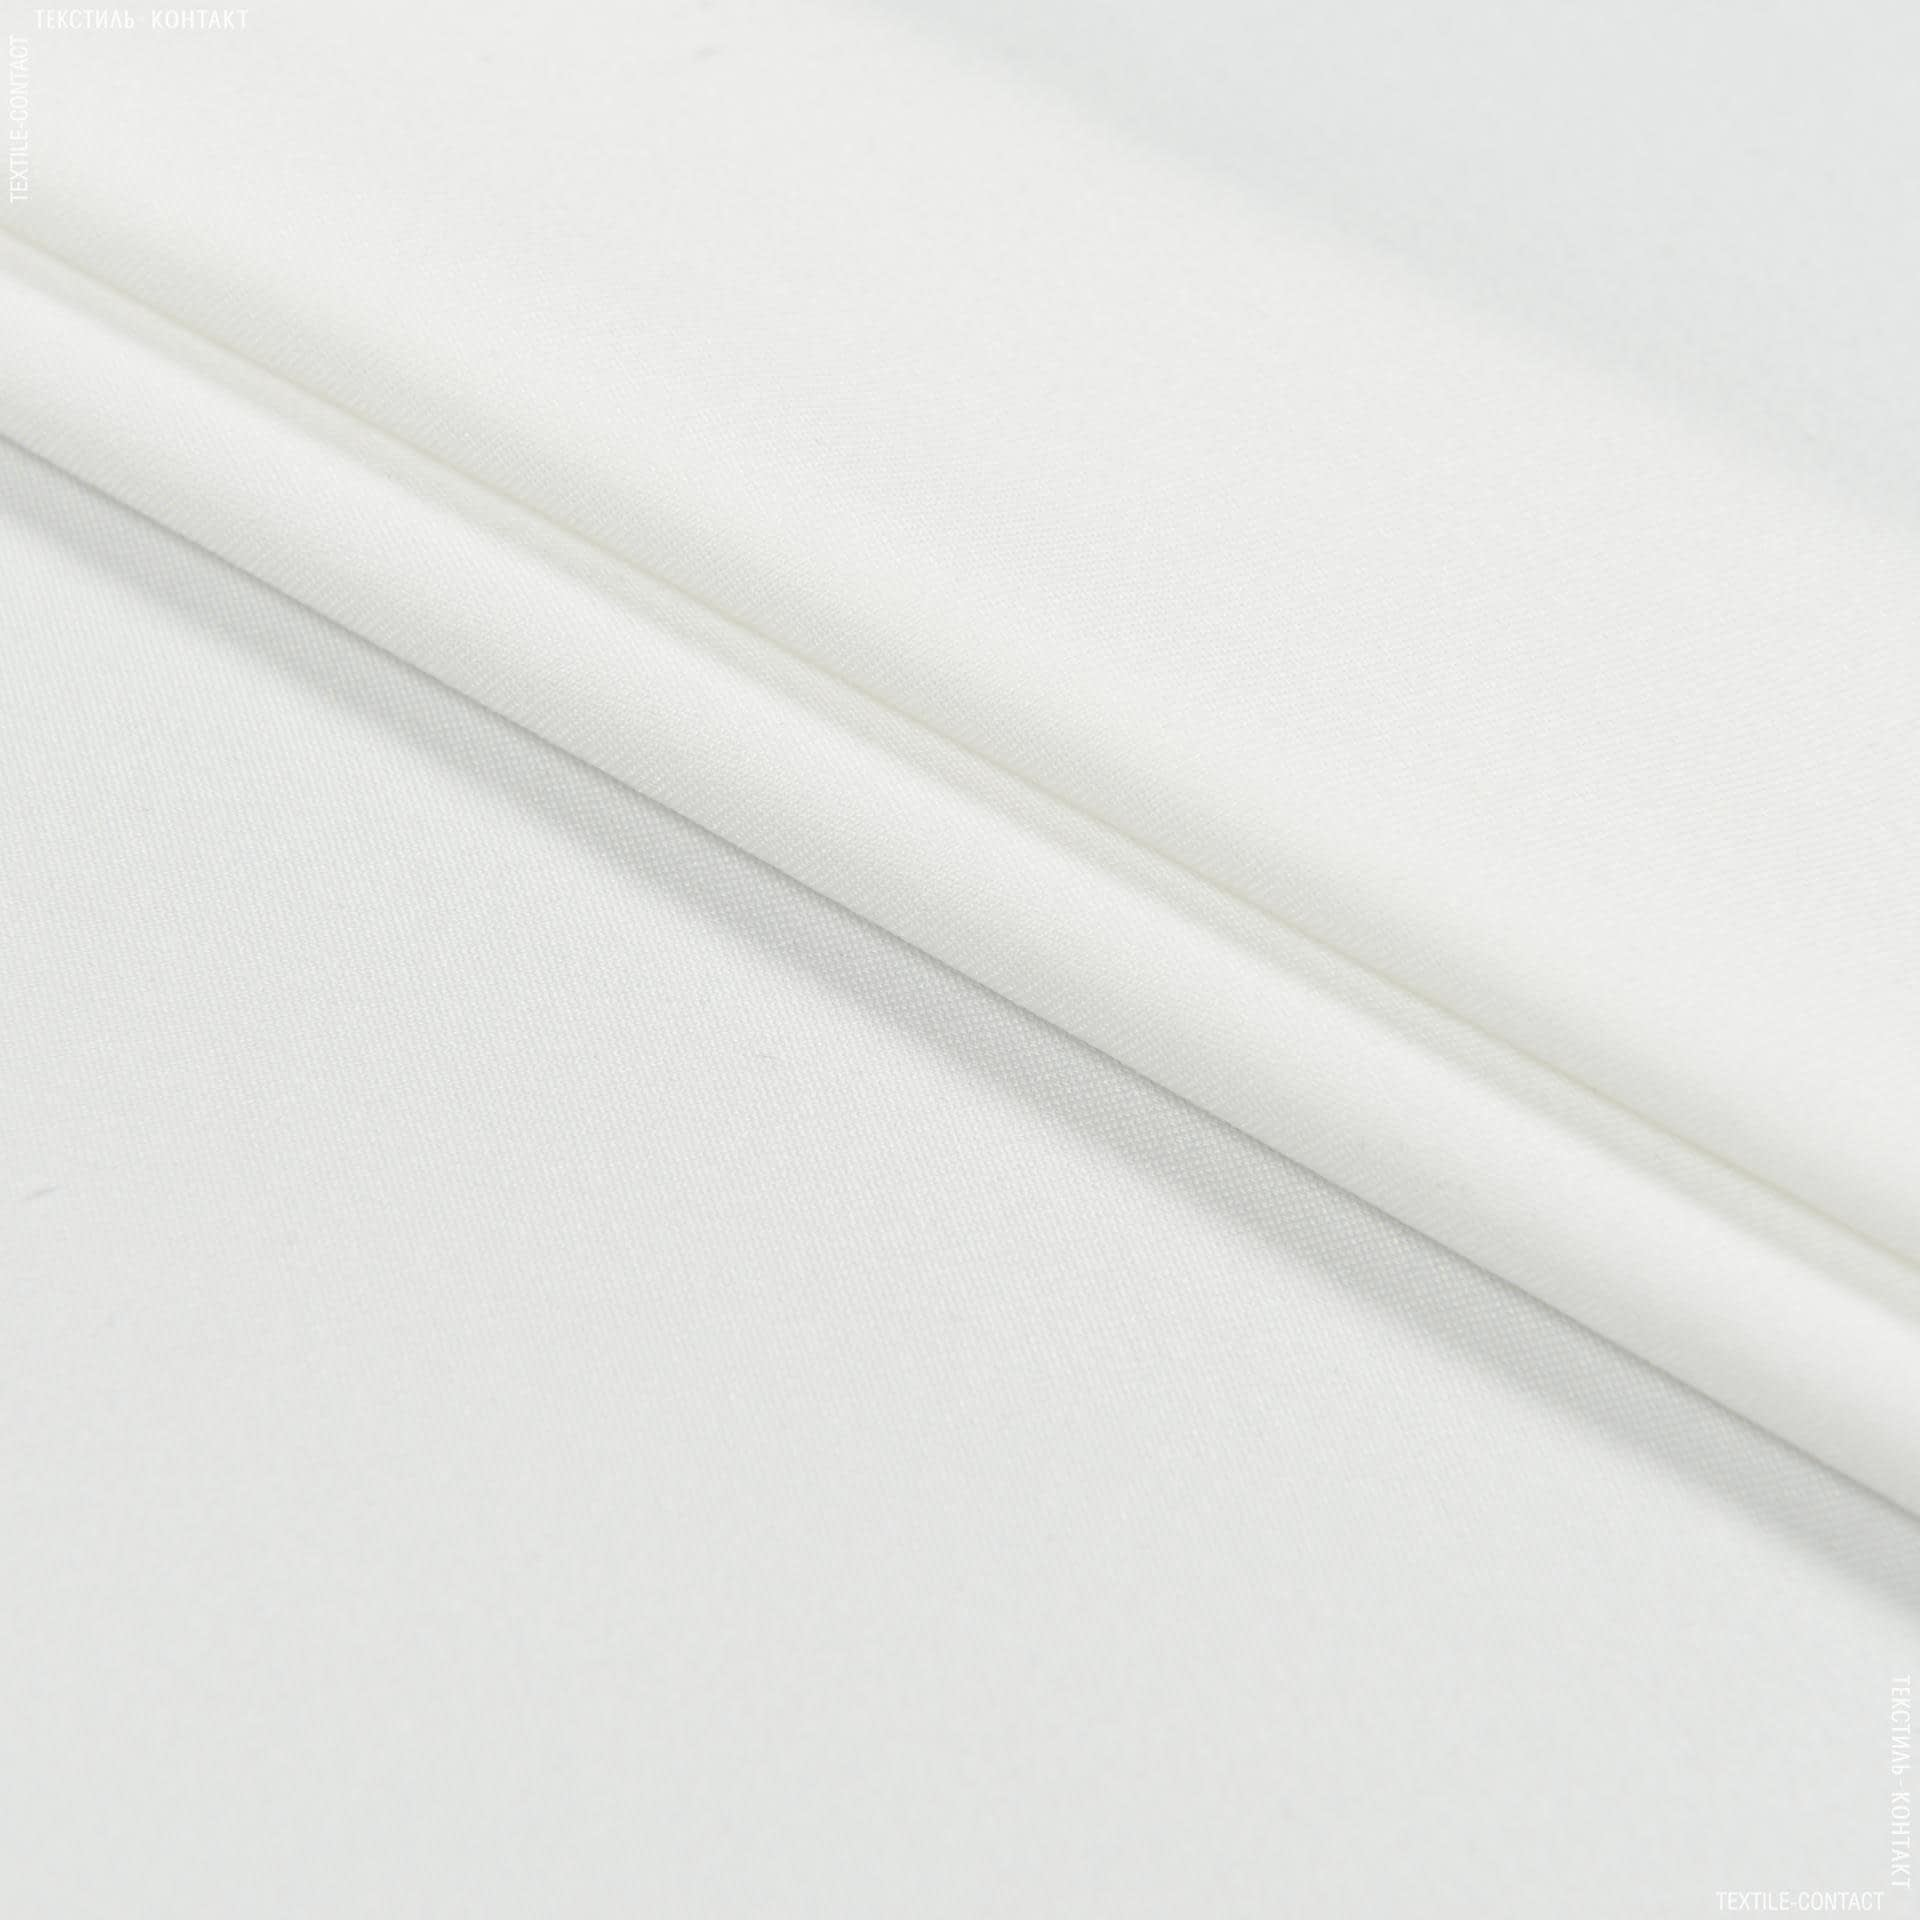 Ткани для спортивной одежды - Трикотаж бифлекс супер  биэластан (бандаж) светло-молоч